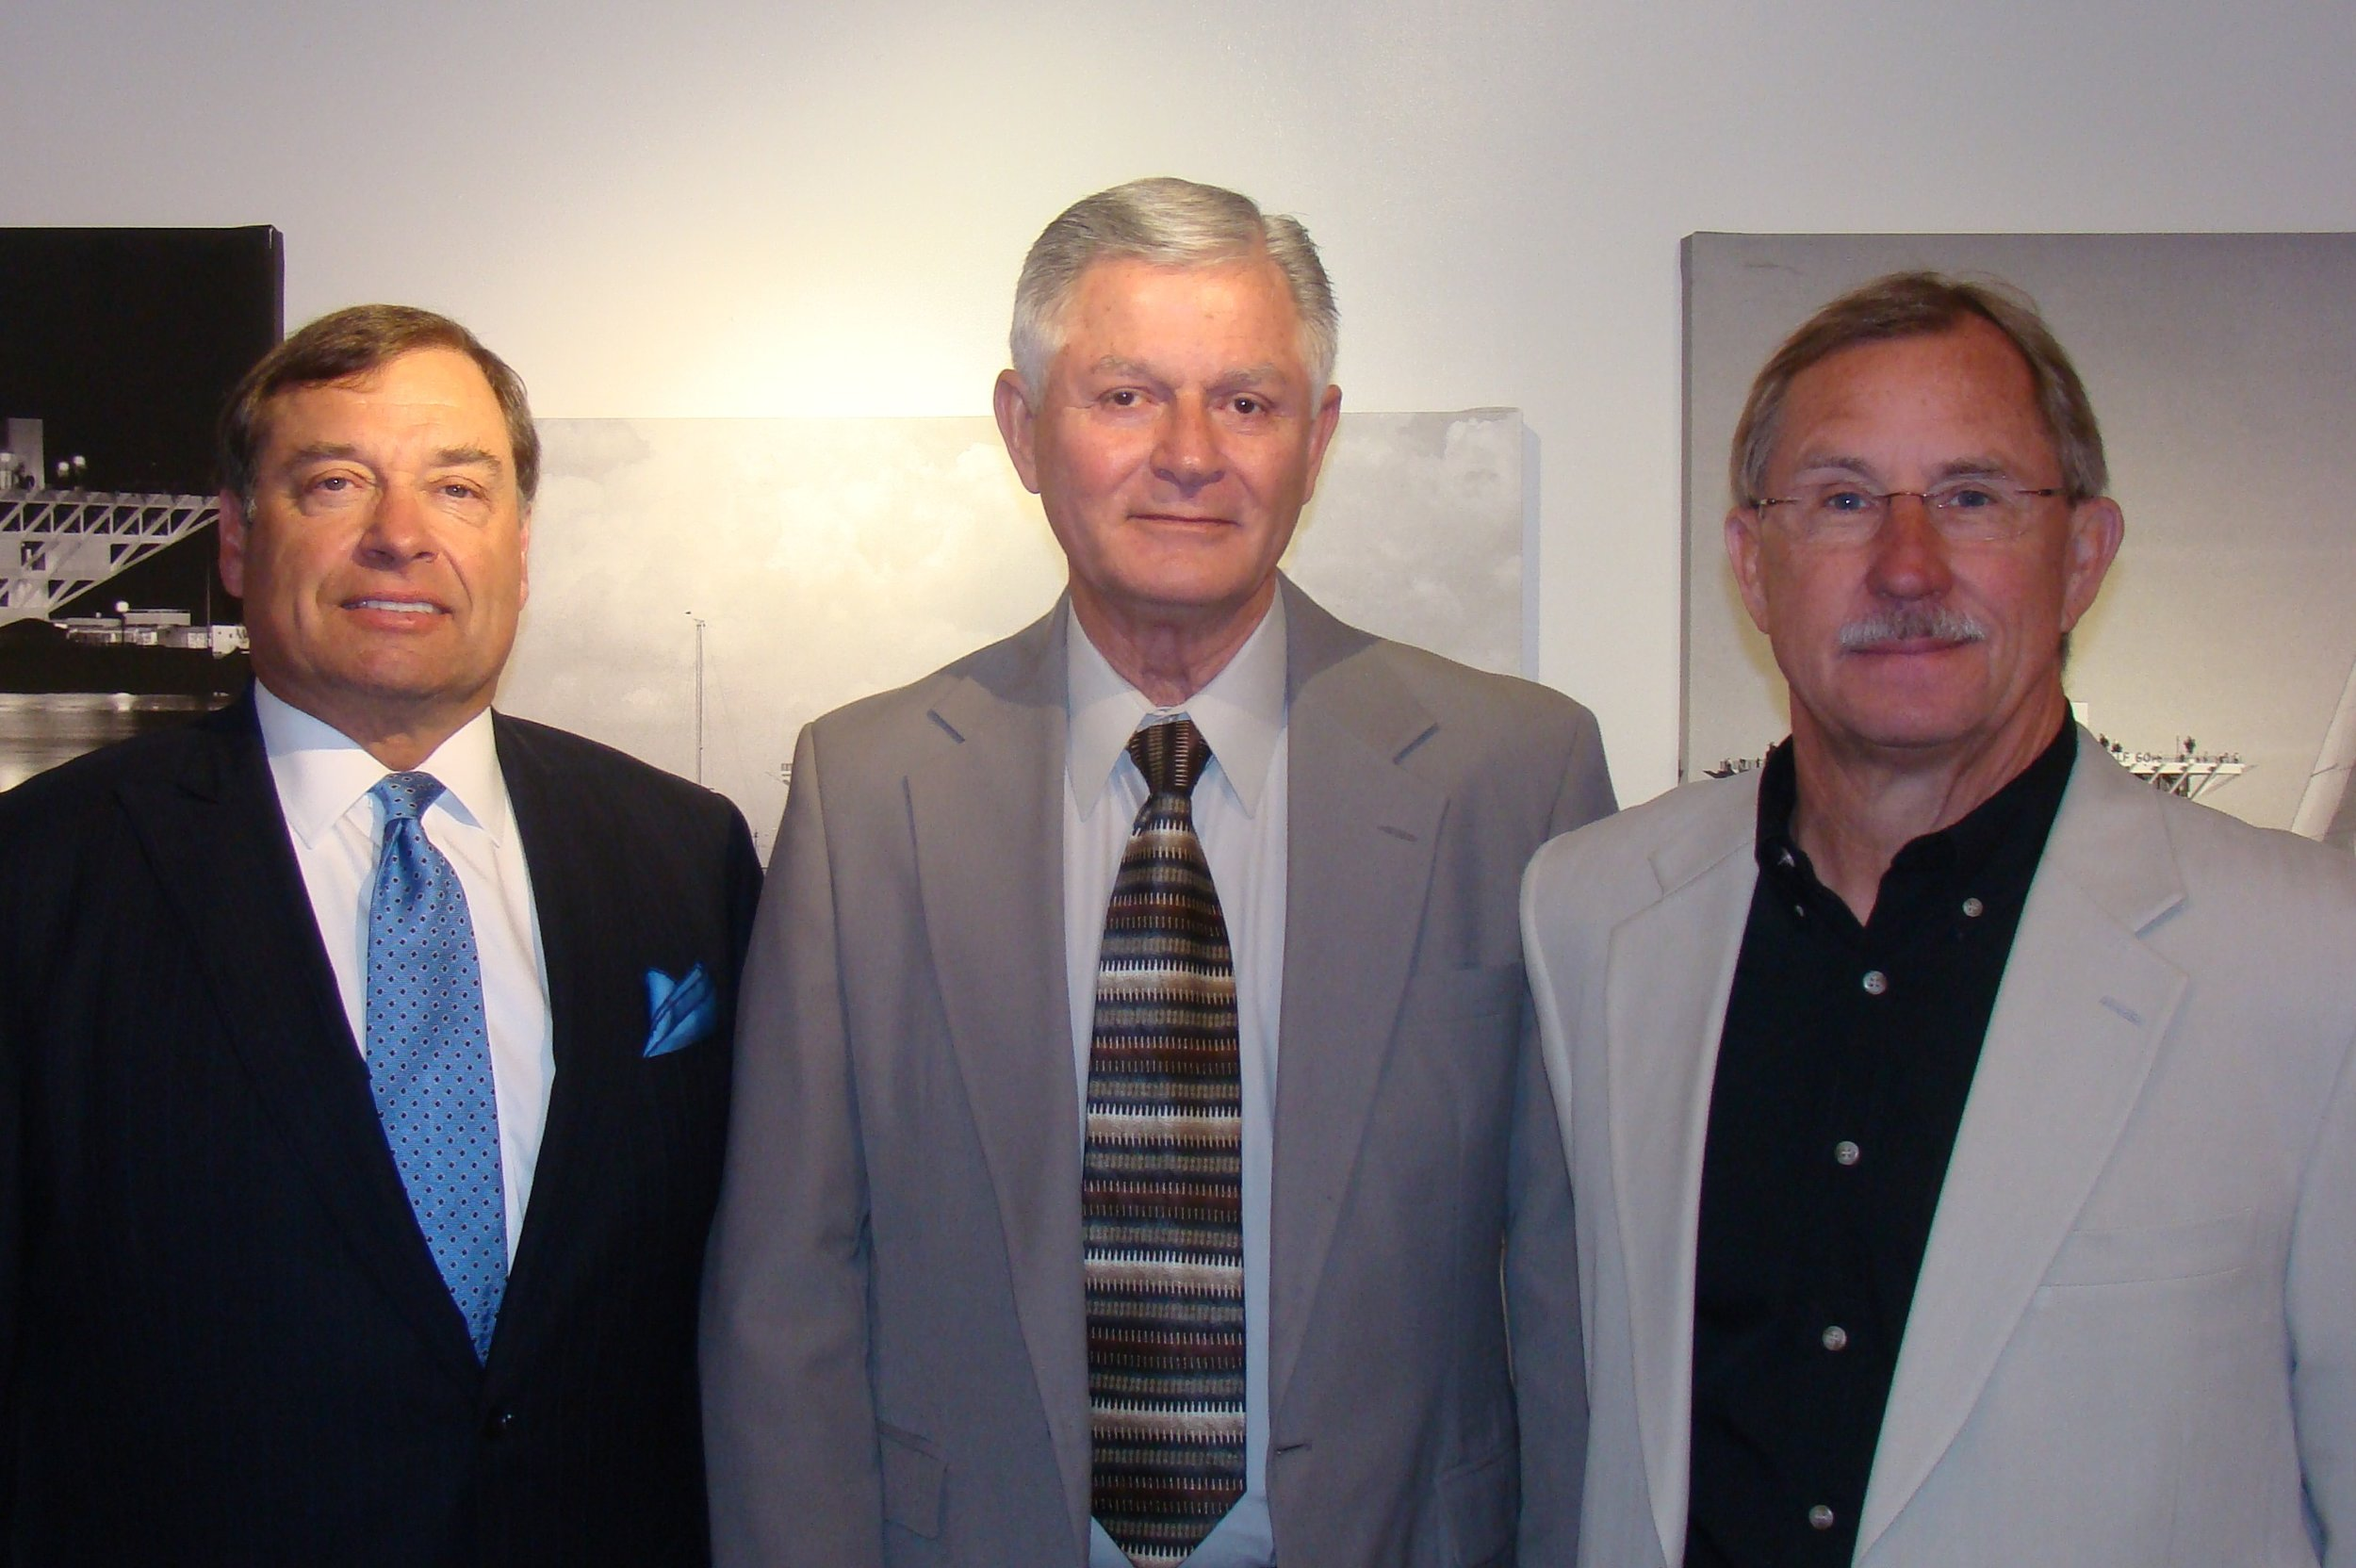 Tanker Snyder, Bob Knight & John Leenhouts - 1, 14 Mar '12.JPG